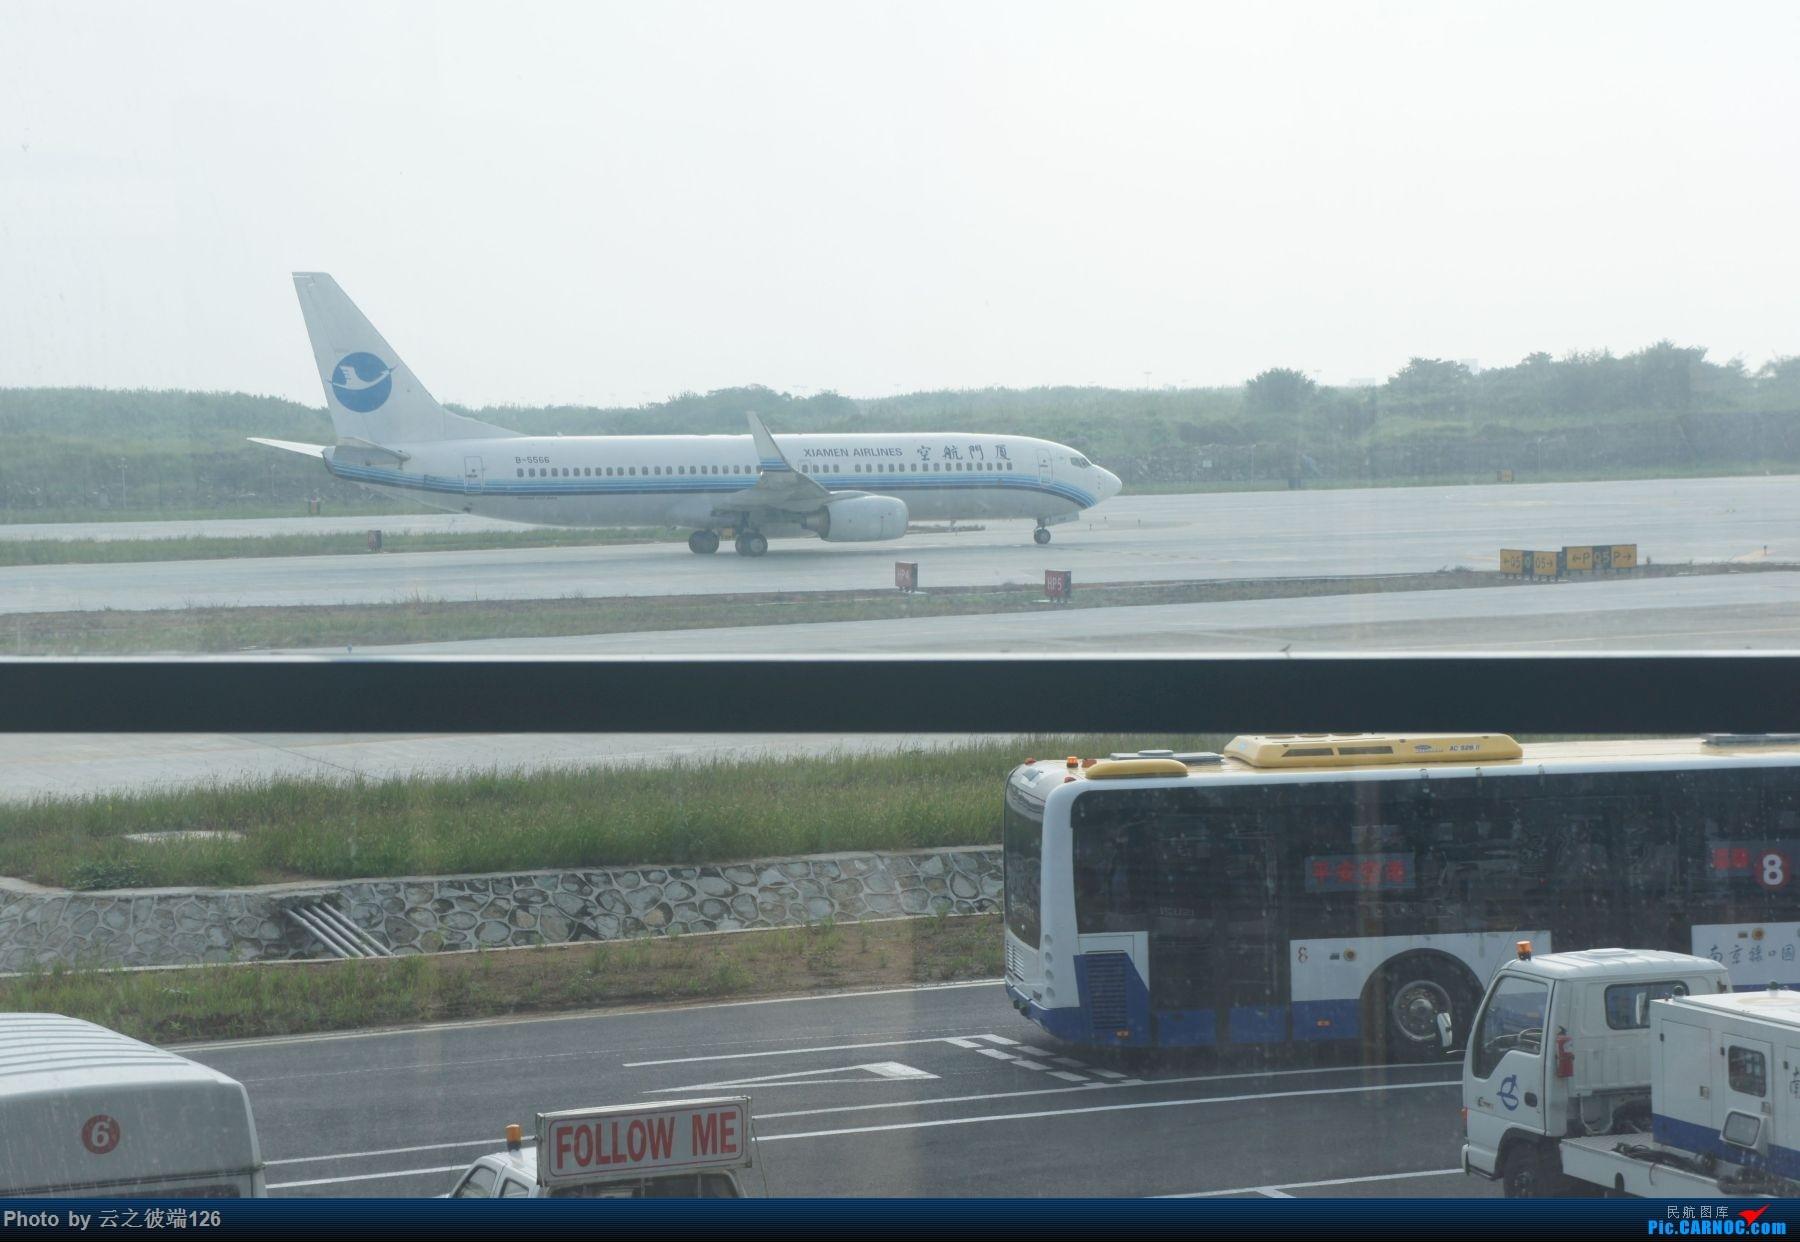 Re:[原创]迟到两年的游记 -----------NKG-SZX-NKG ZH+白菜航------ BOEING 737-800 B-5566 中国南京禄口国际机场